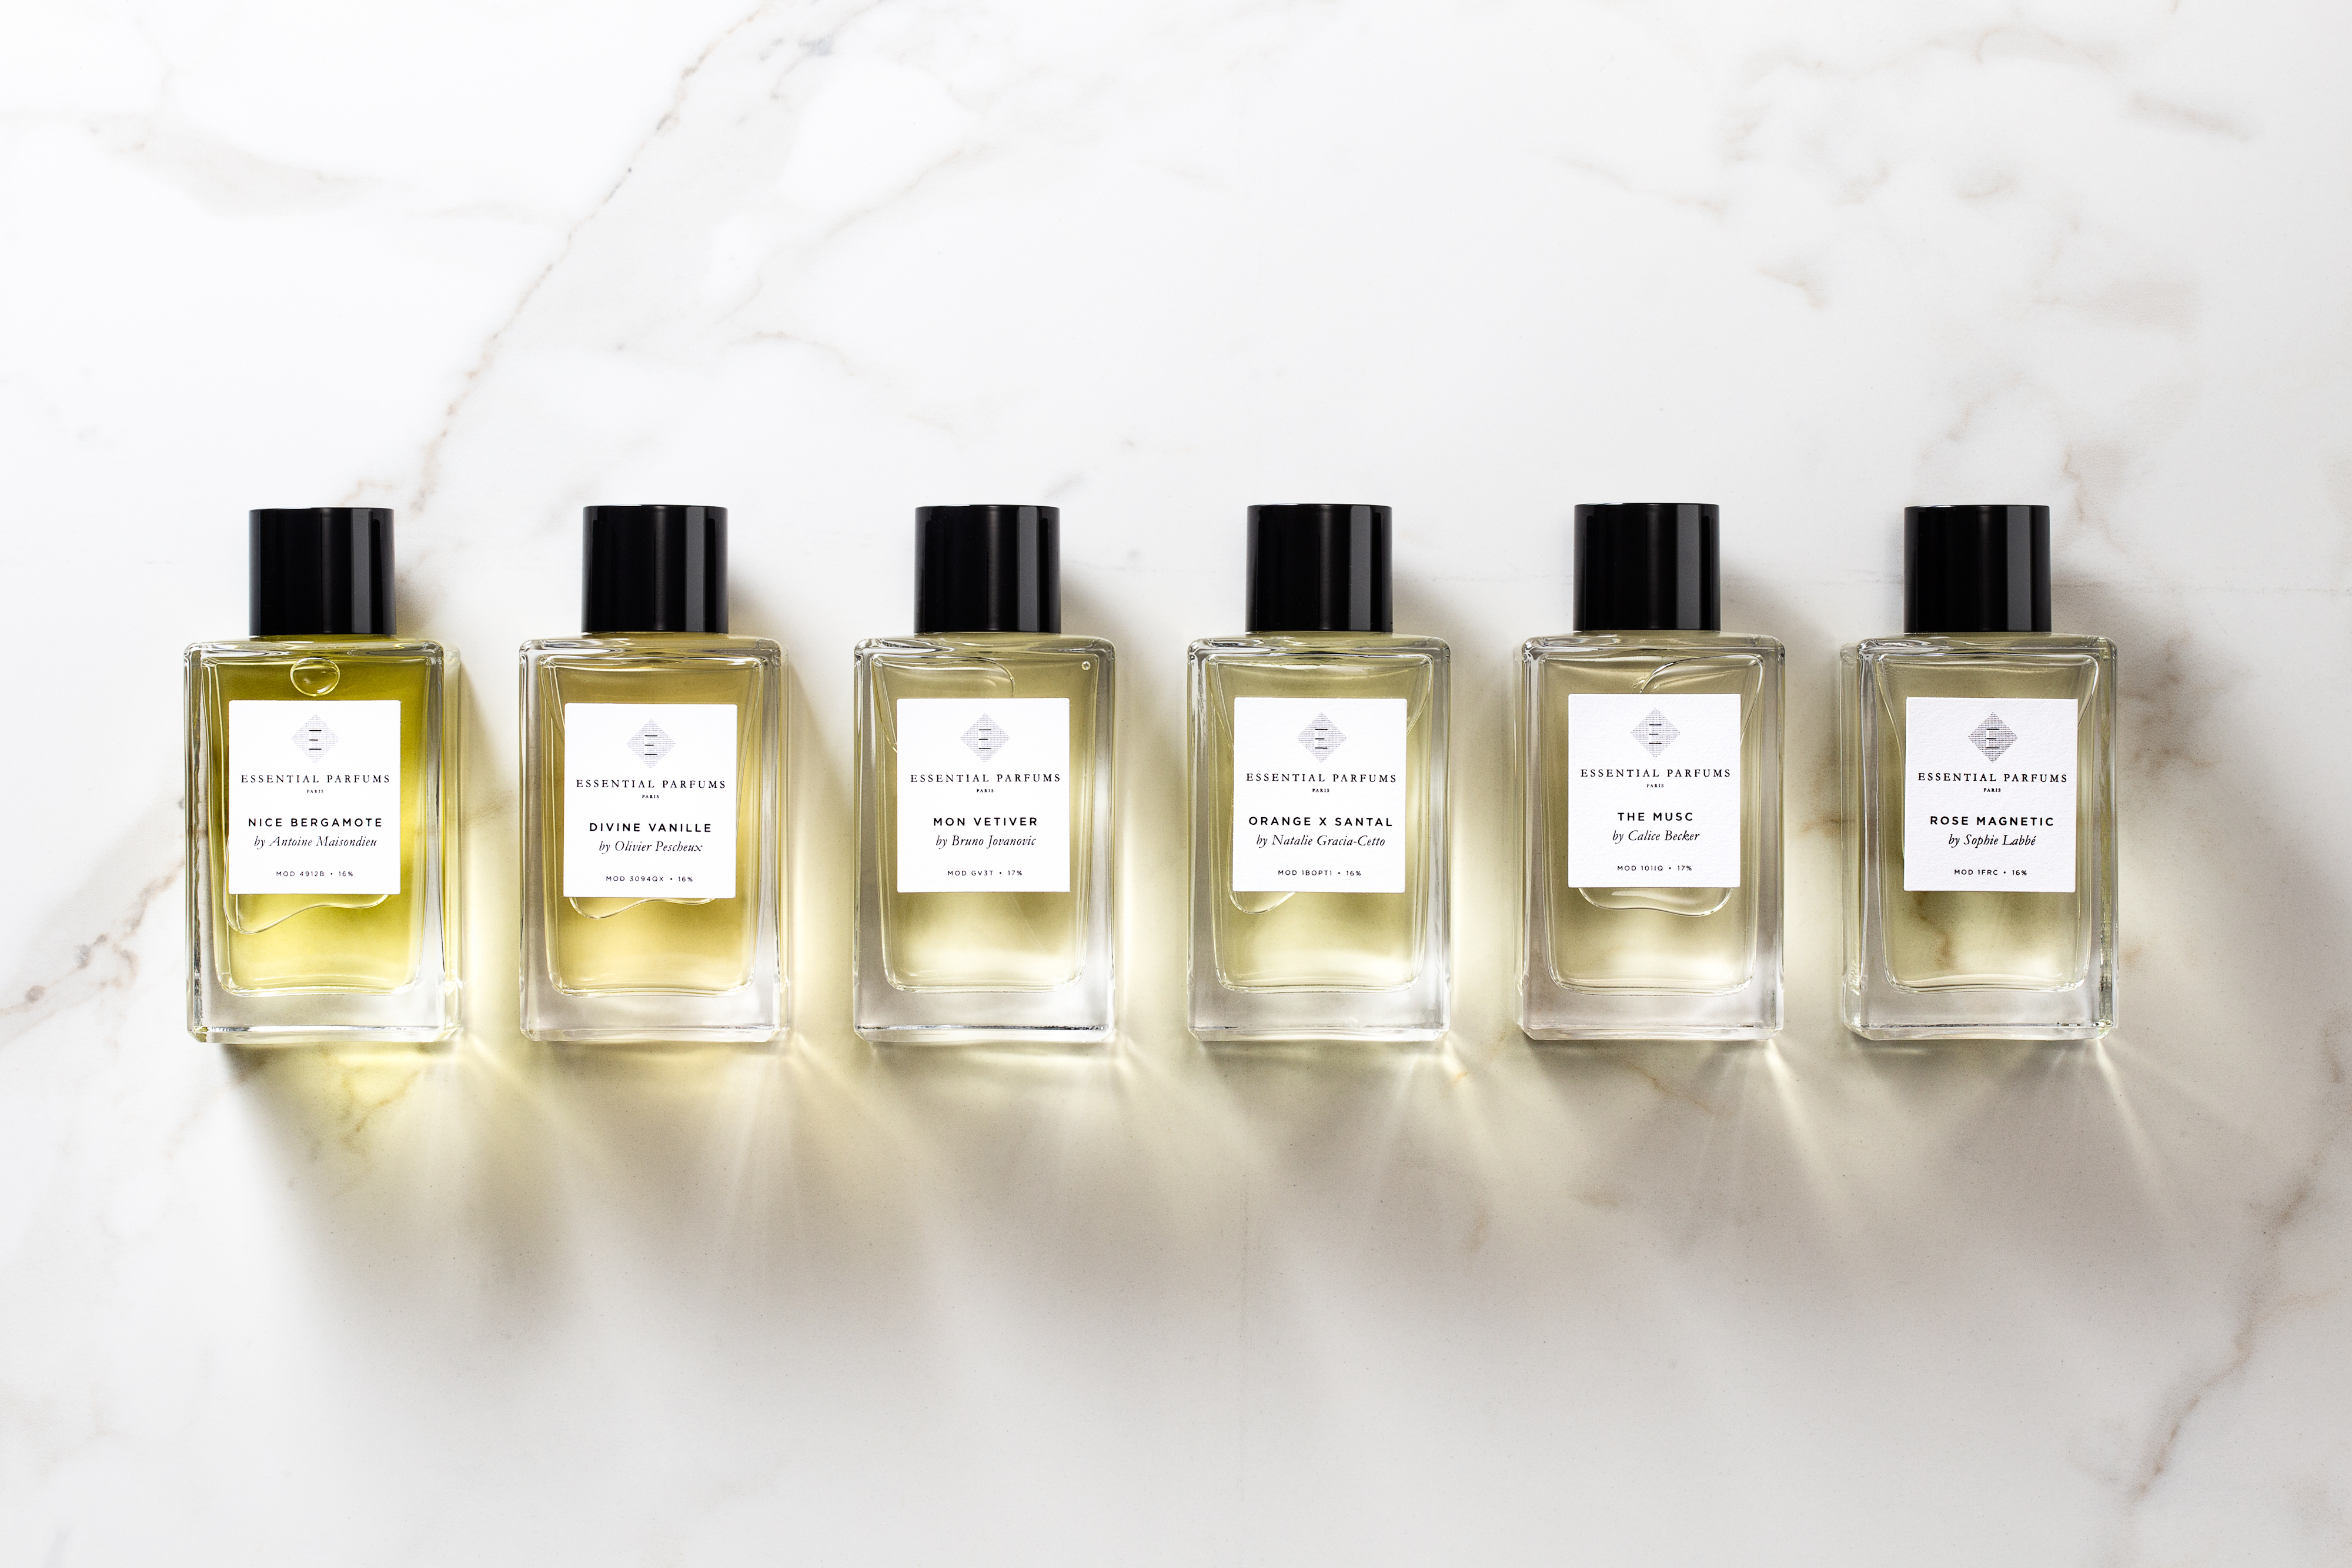 Essential Parfum - w tym Mon Vetiver